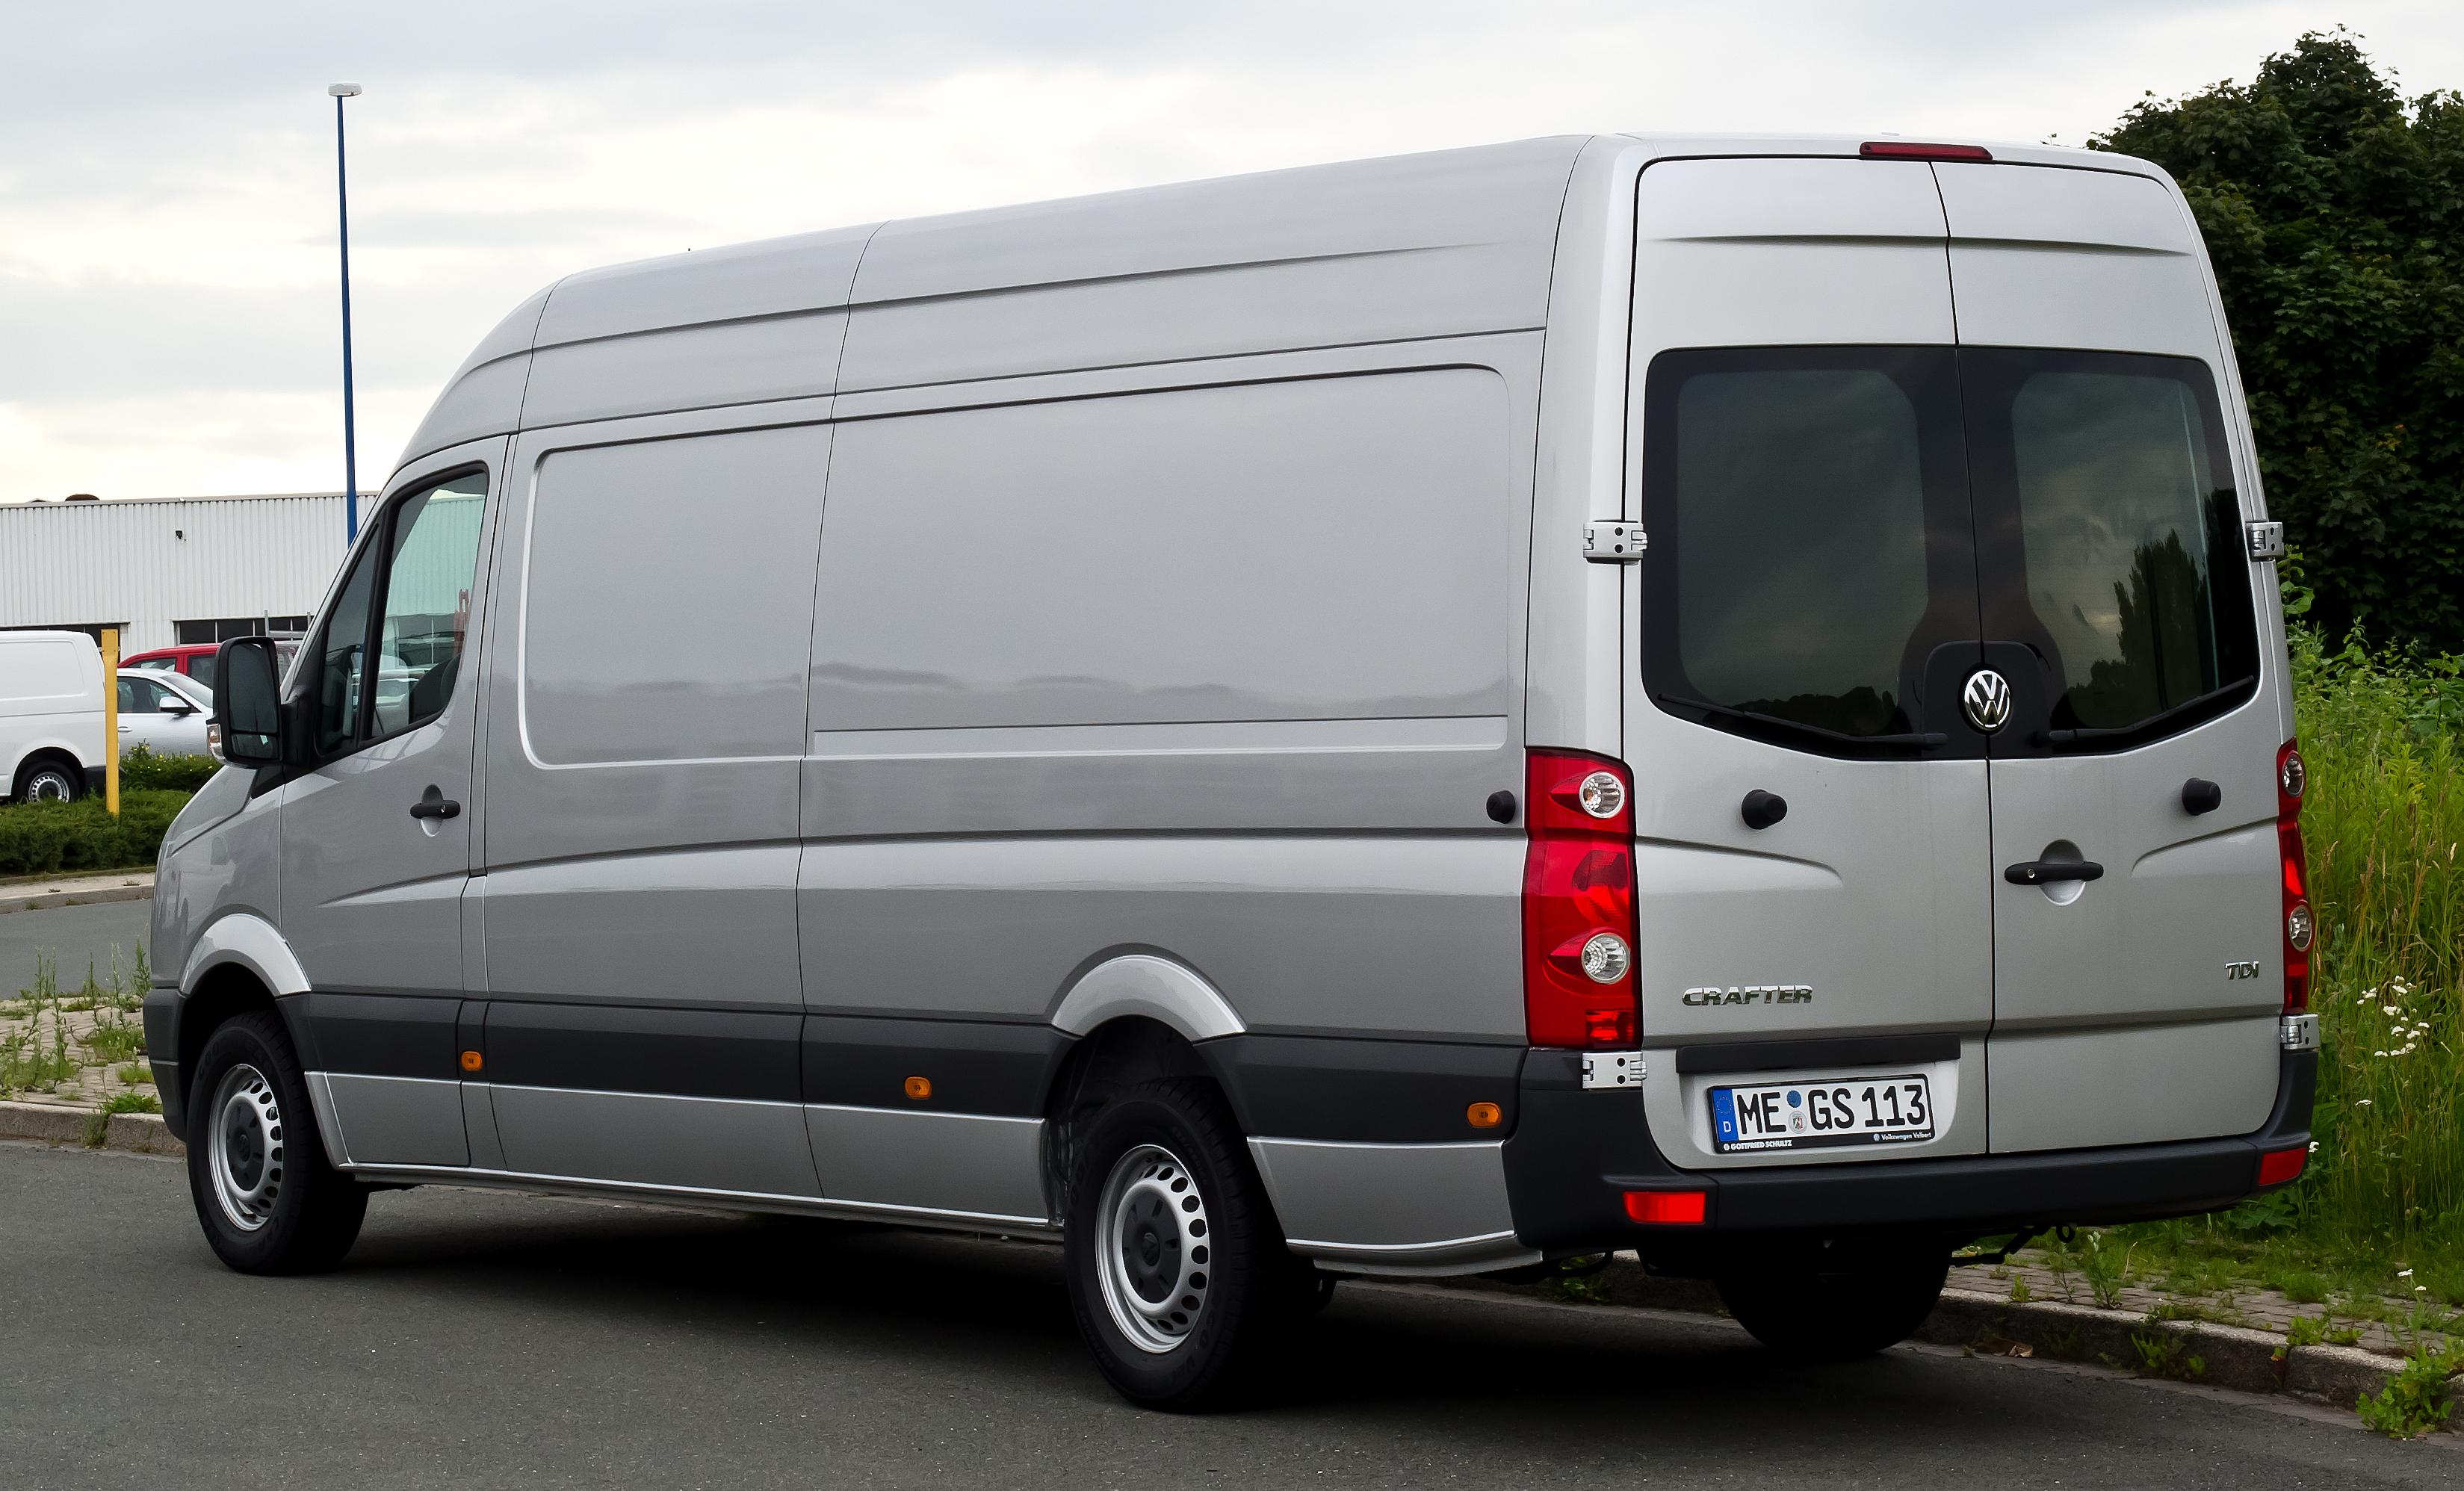 Mercedes Sprinter 2017 >> File:VW Crafter 2.0 TDI (Facelift) – Heckansicht, 9. Juli 2012, Velbert.jpg - Wikimedia Commons